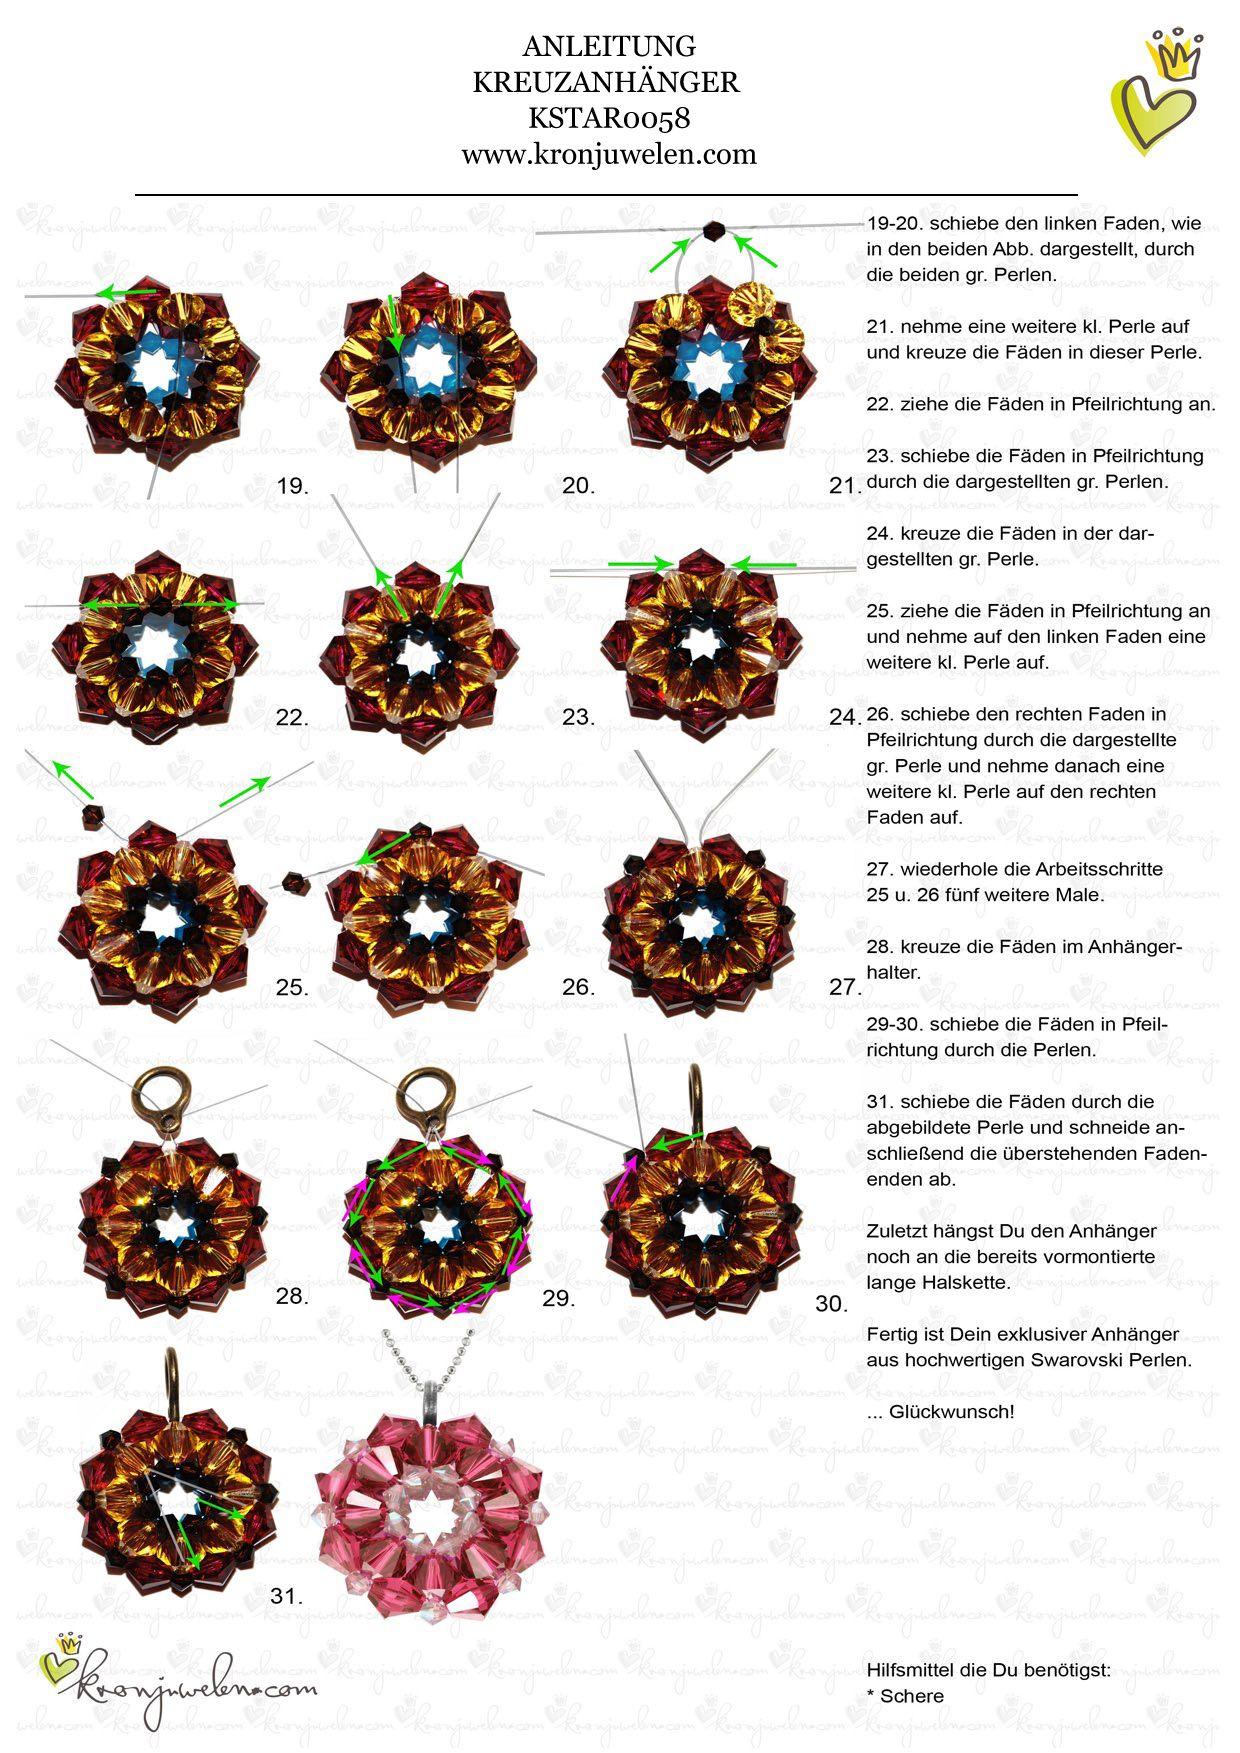 12 oktober 2013 katie melua swarovski amulett schmuck. Black Bedroom Furniture Sets. Home Design Ideas